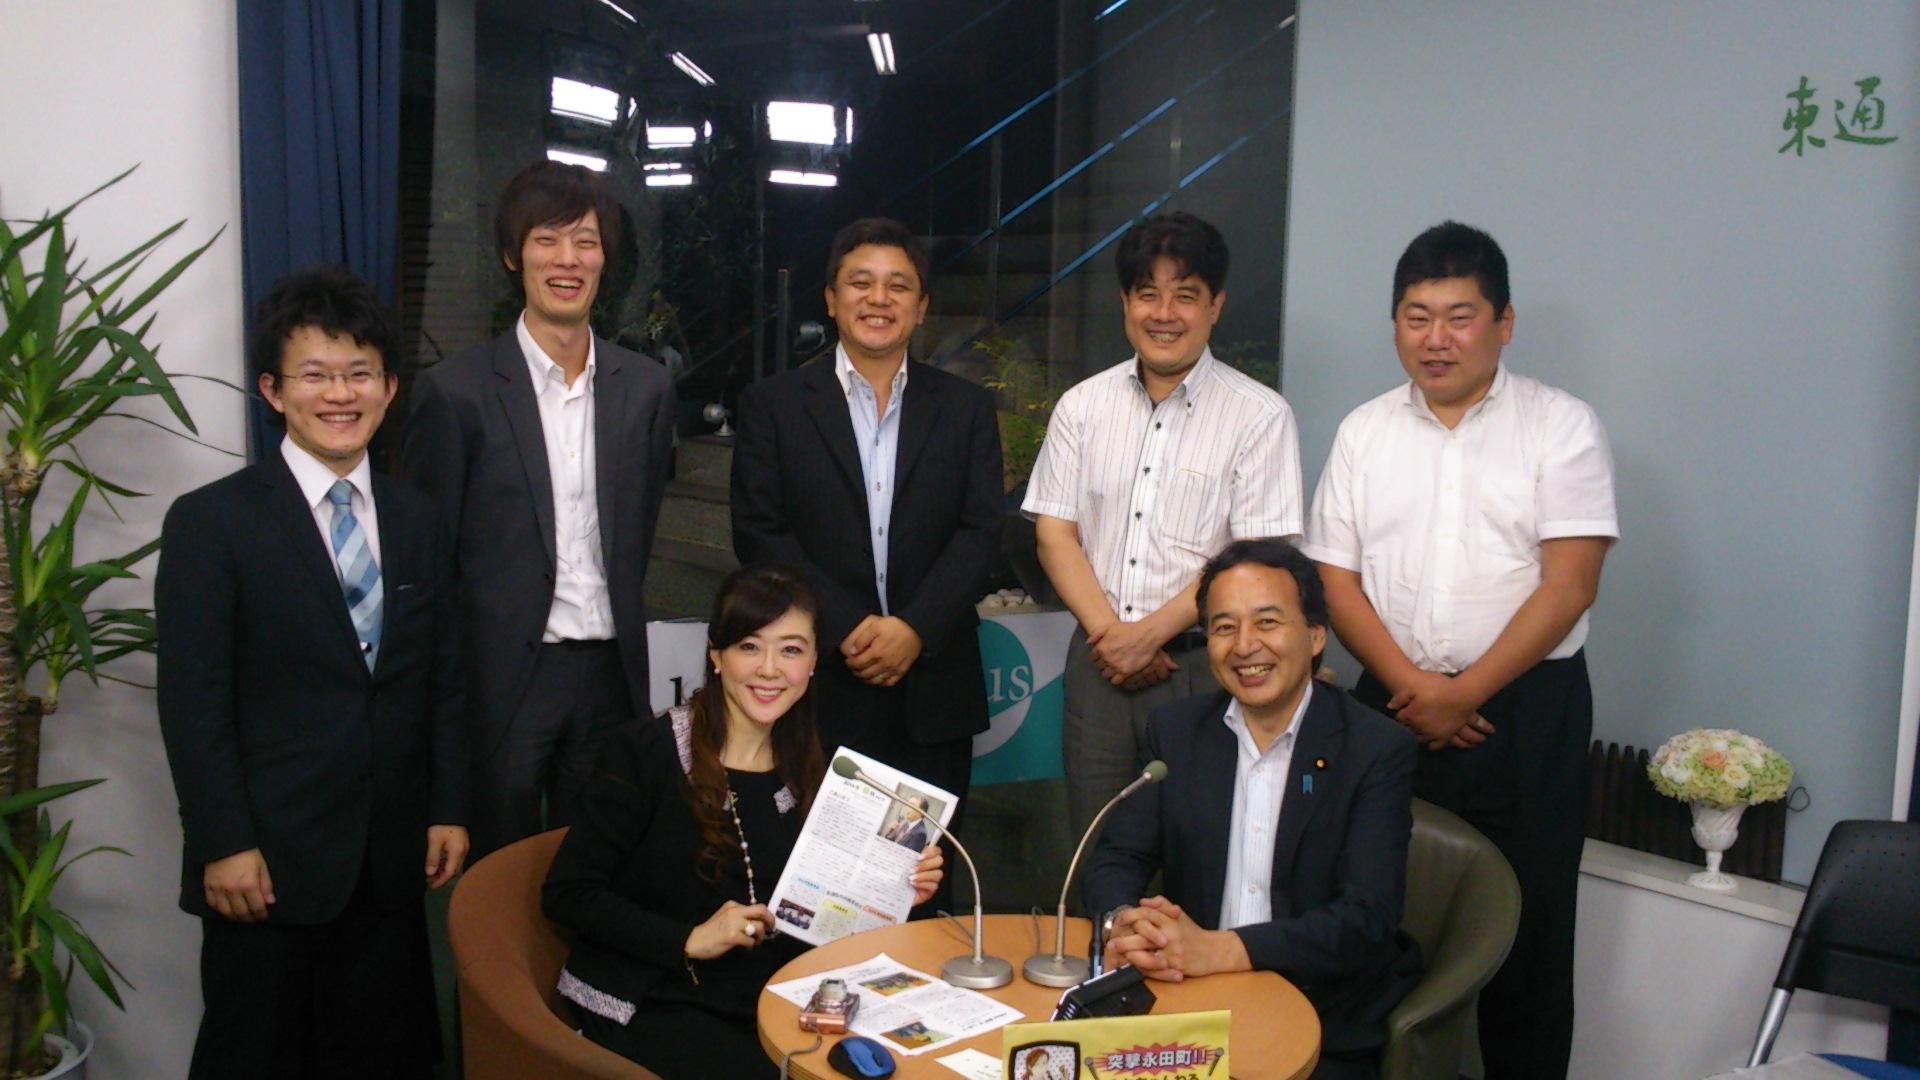 Ustream「みわちゃんねる 突撃!!永田町!」に出演